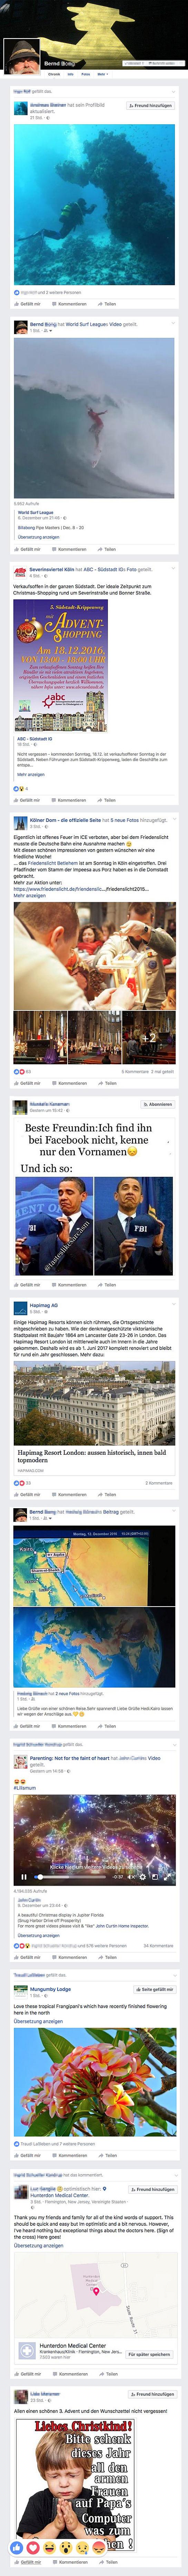 fb timeline bernd